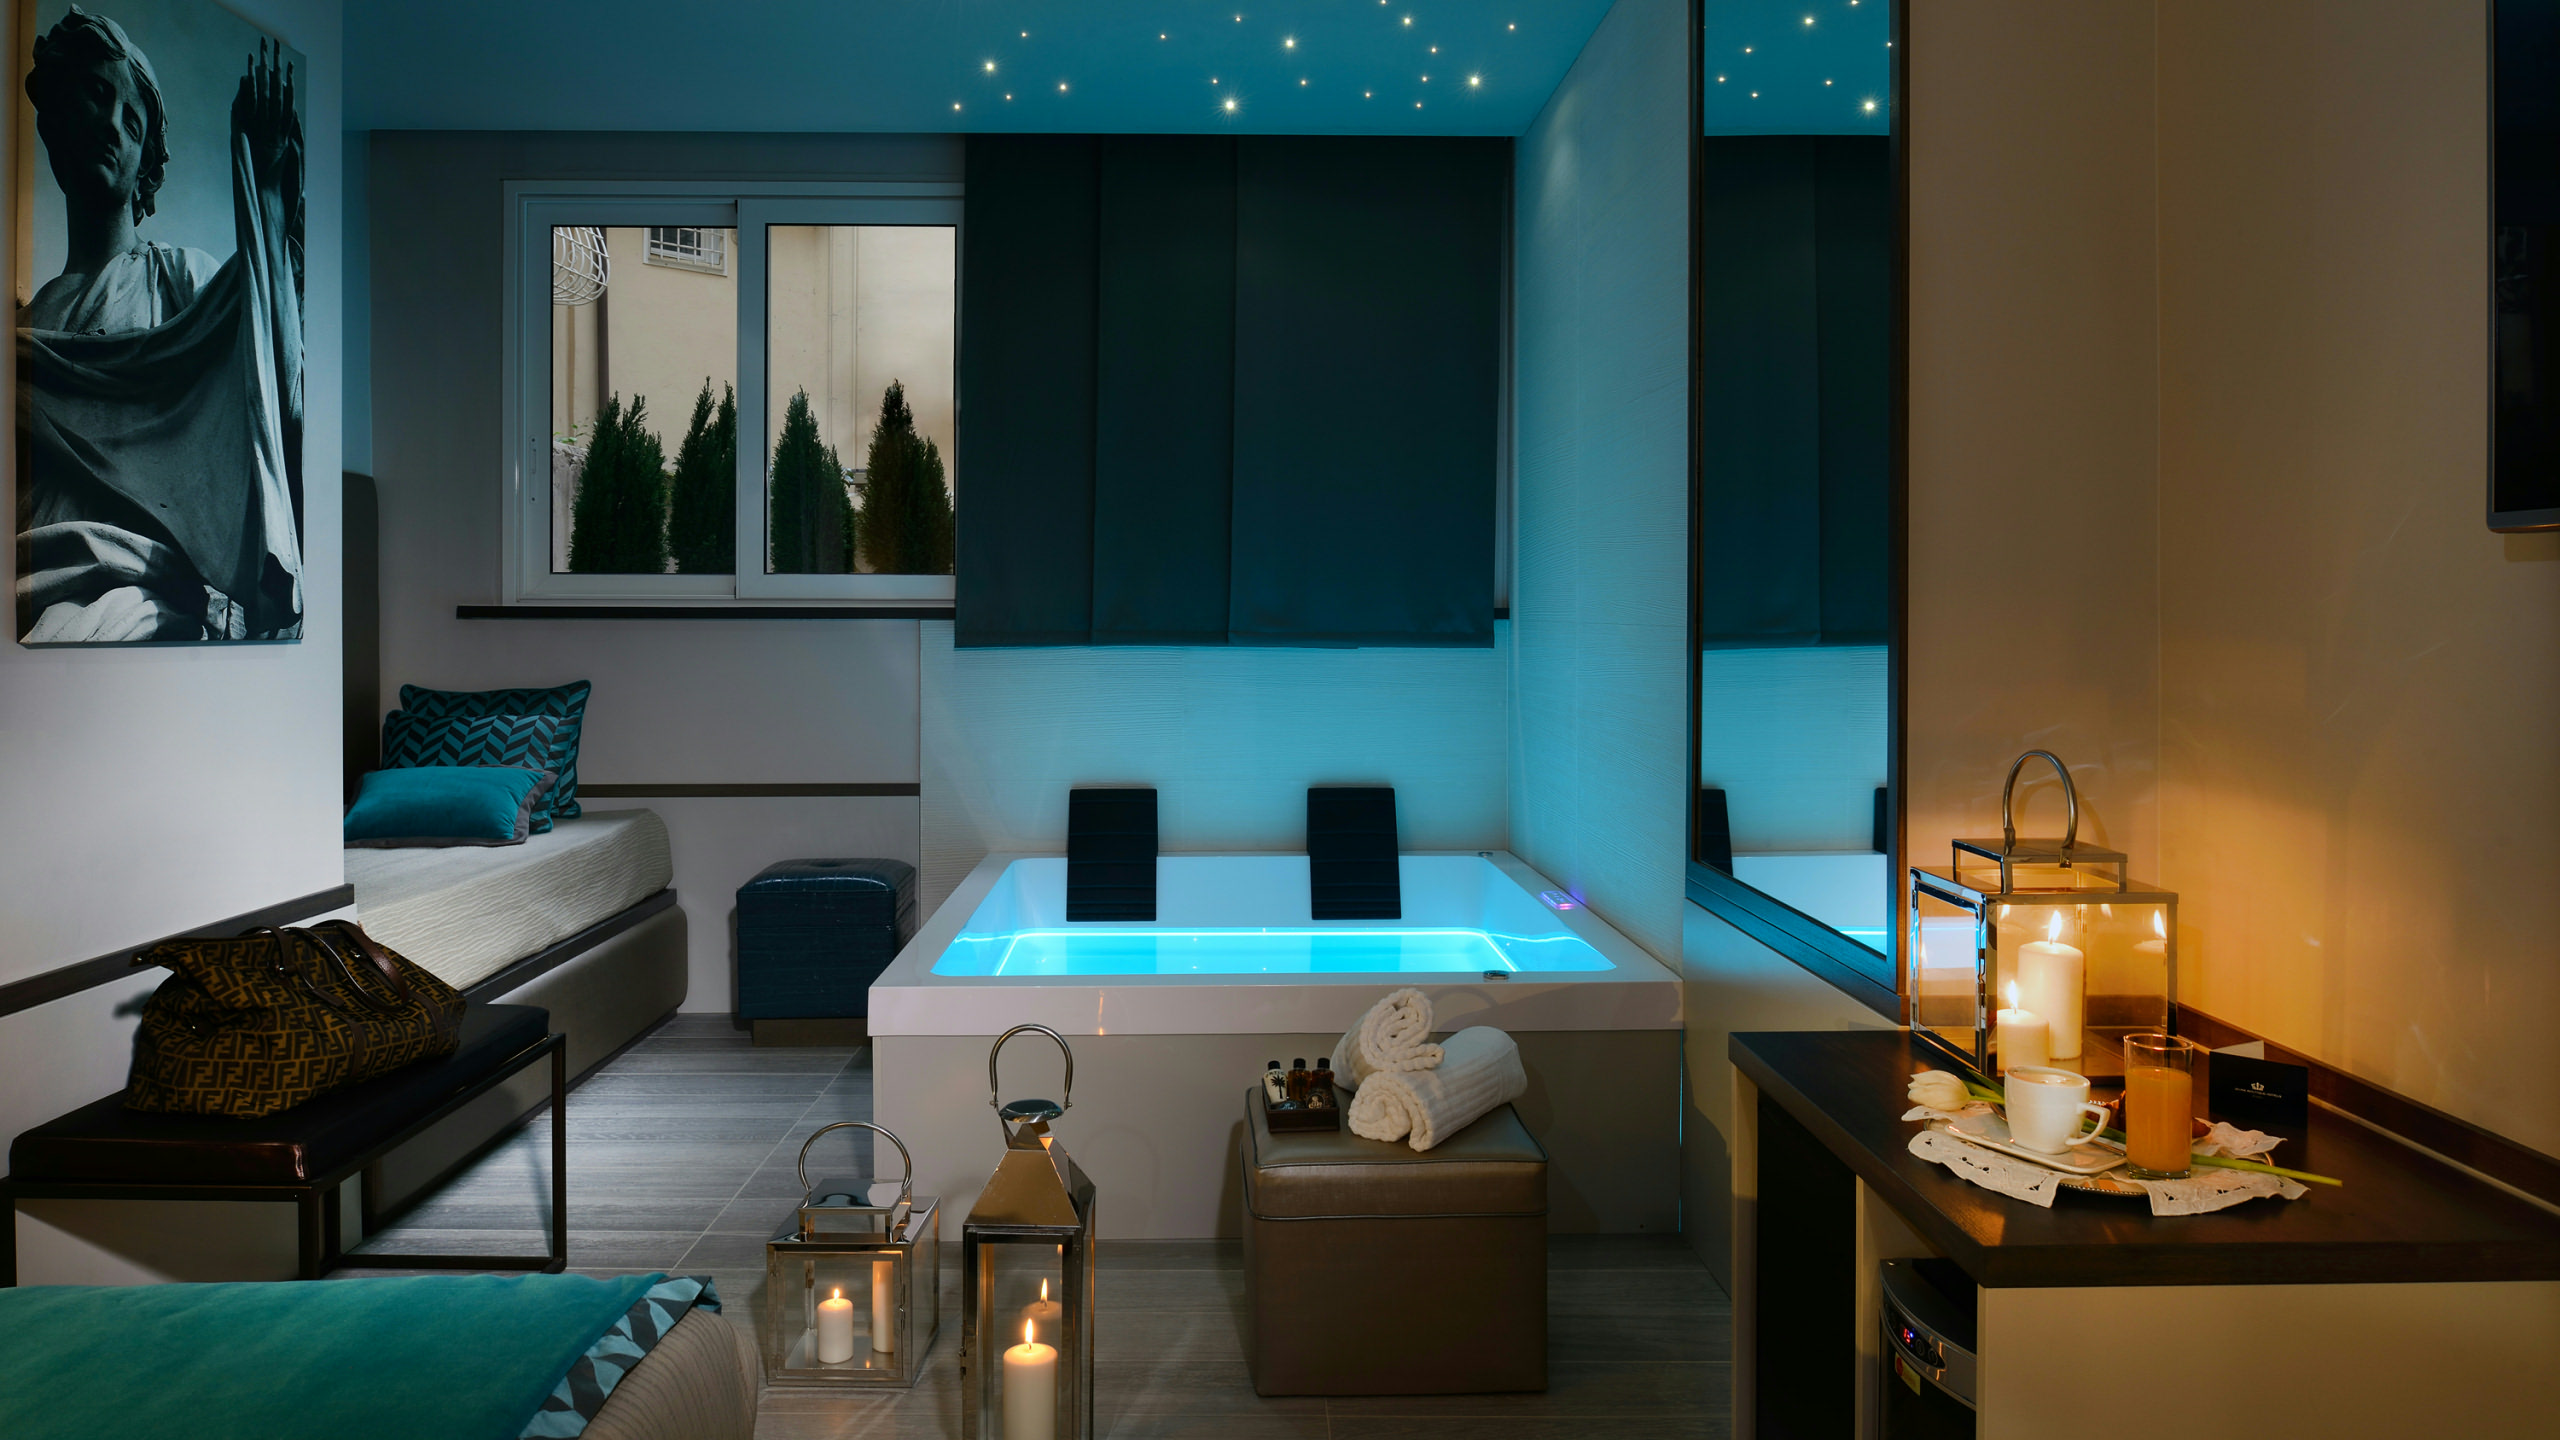 san-carlo-suite-rome-exclusive-14957